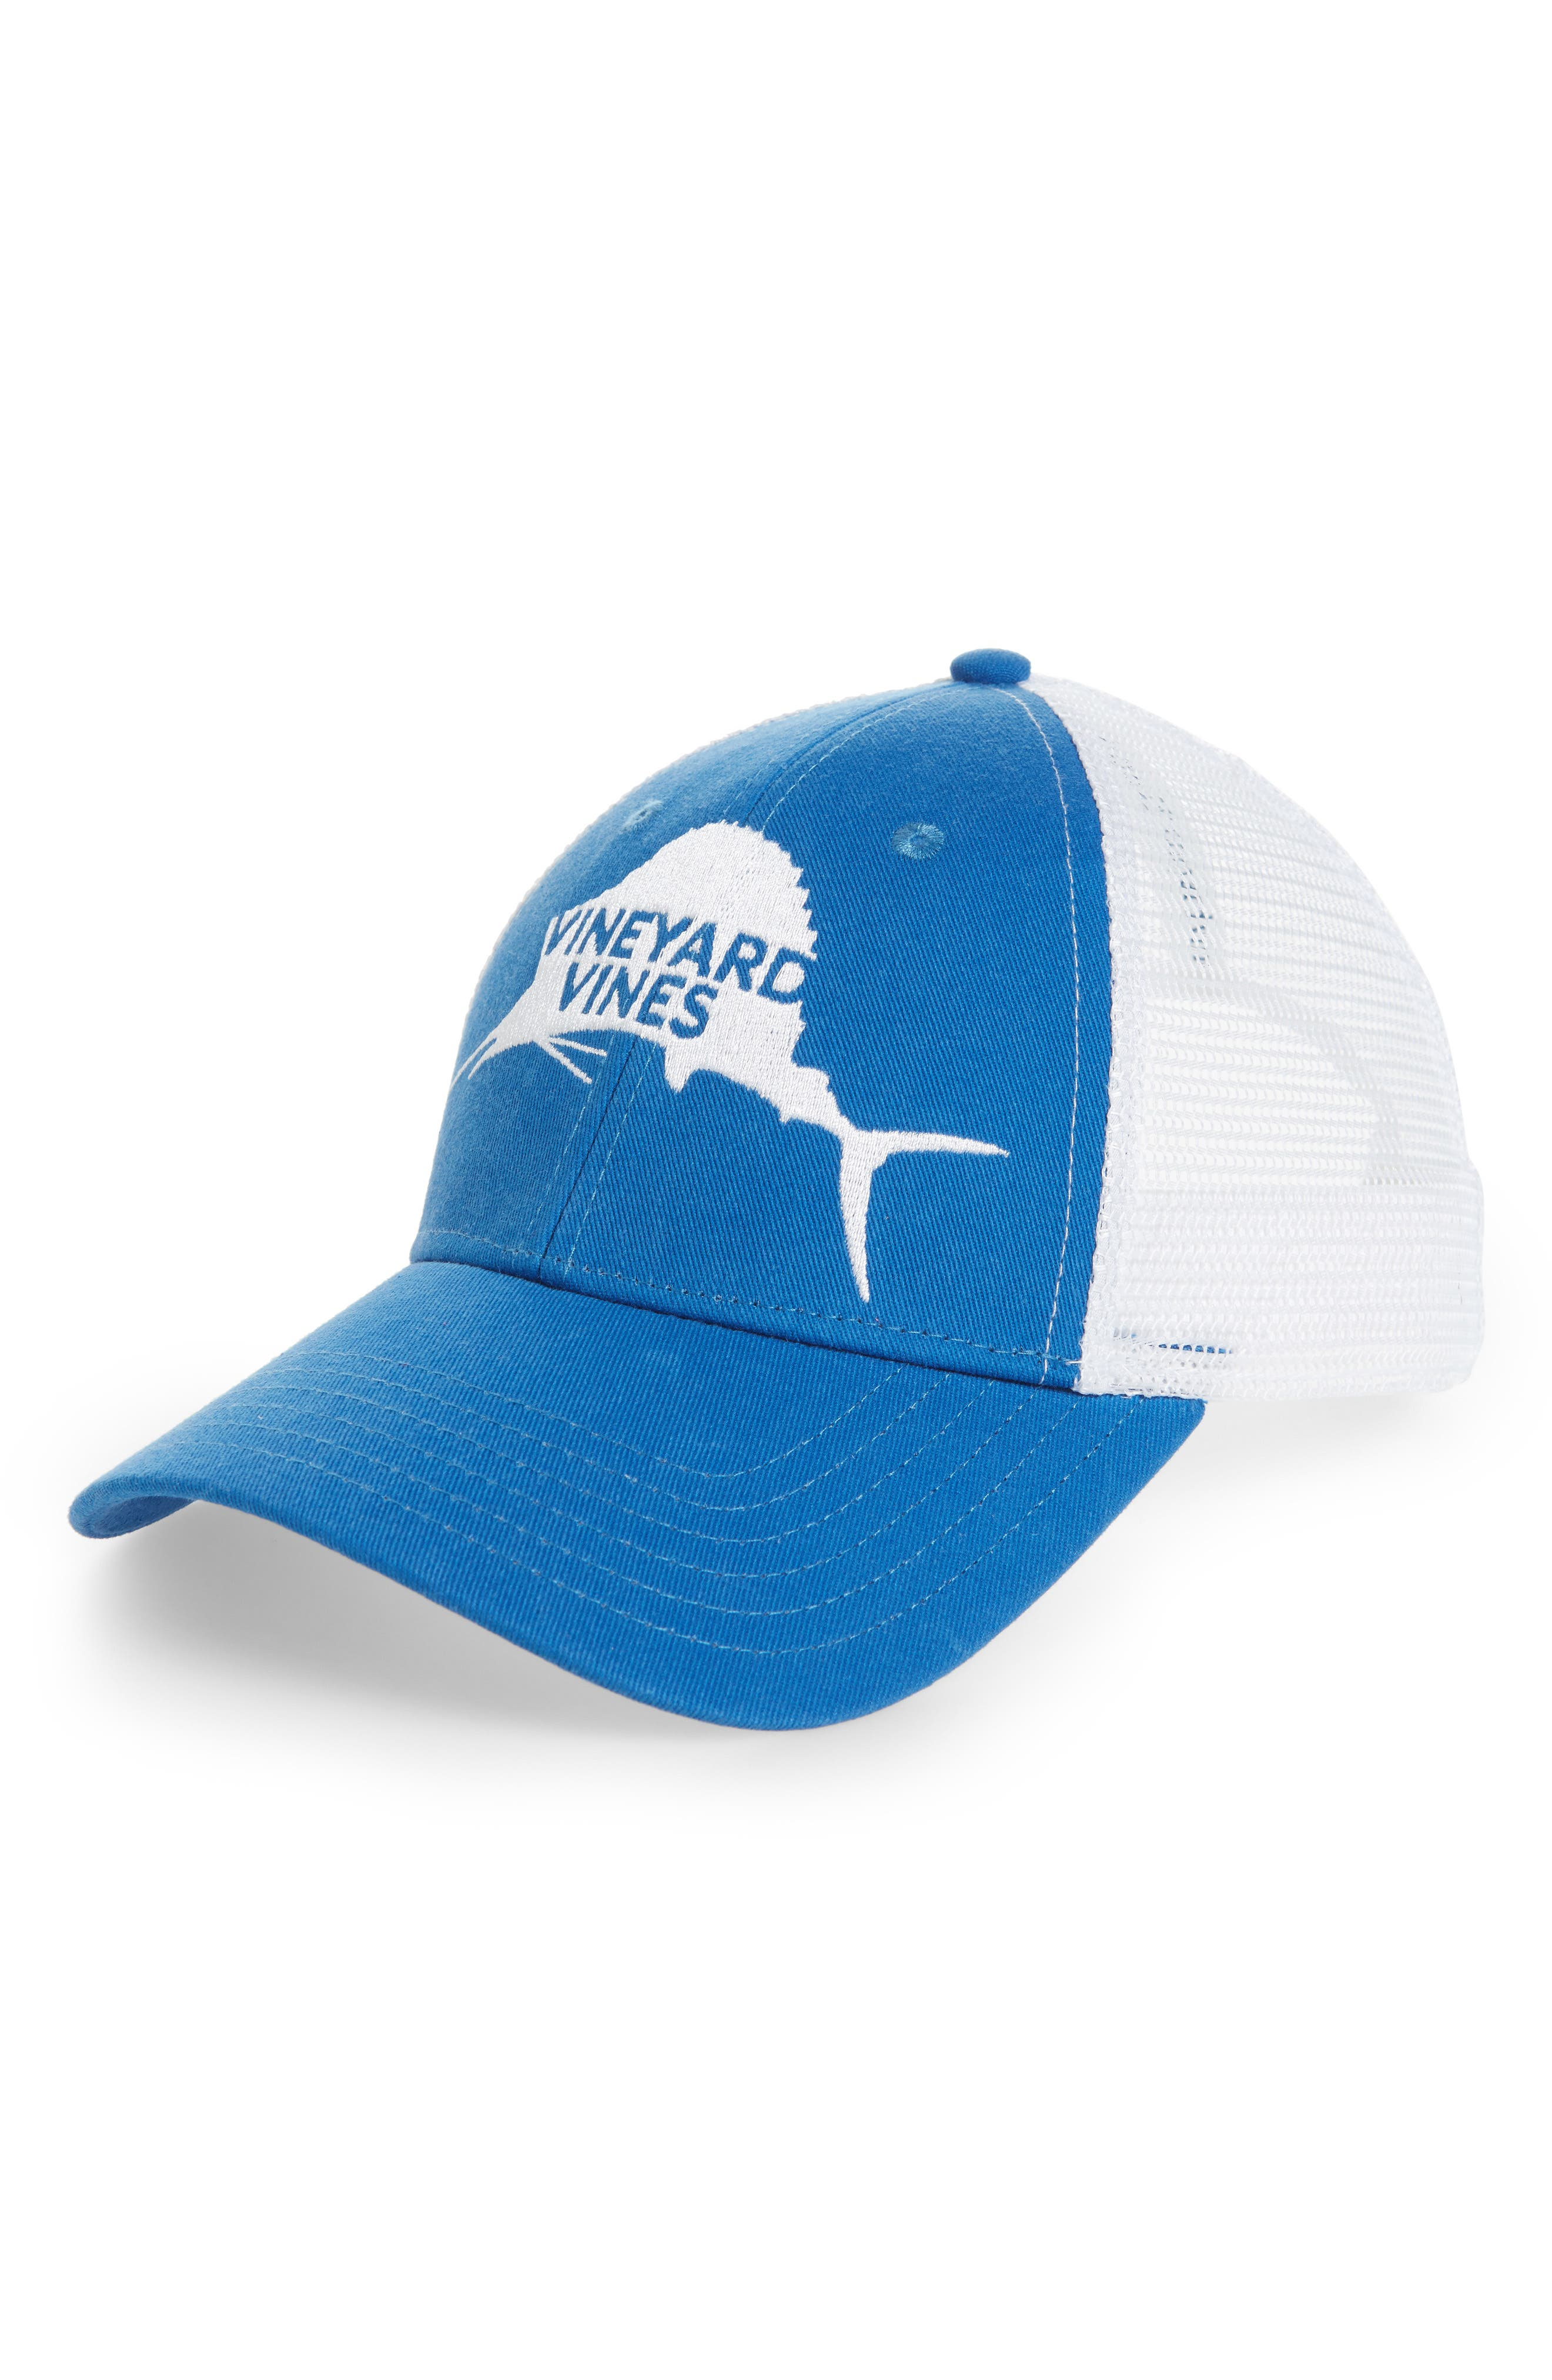 Sailfish Trucker Cap,                         Main,                         color, 427